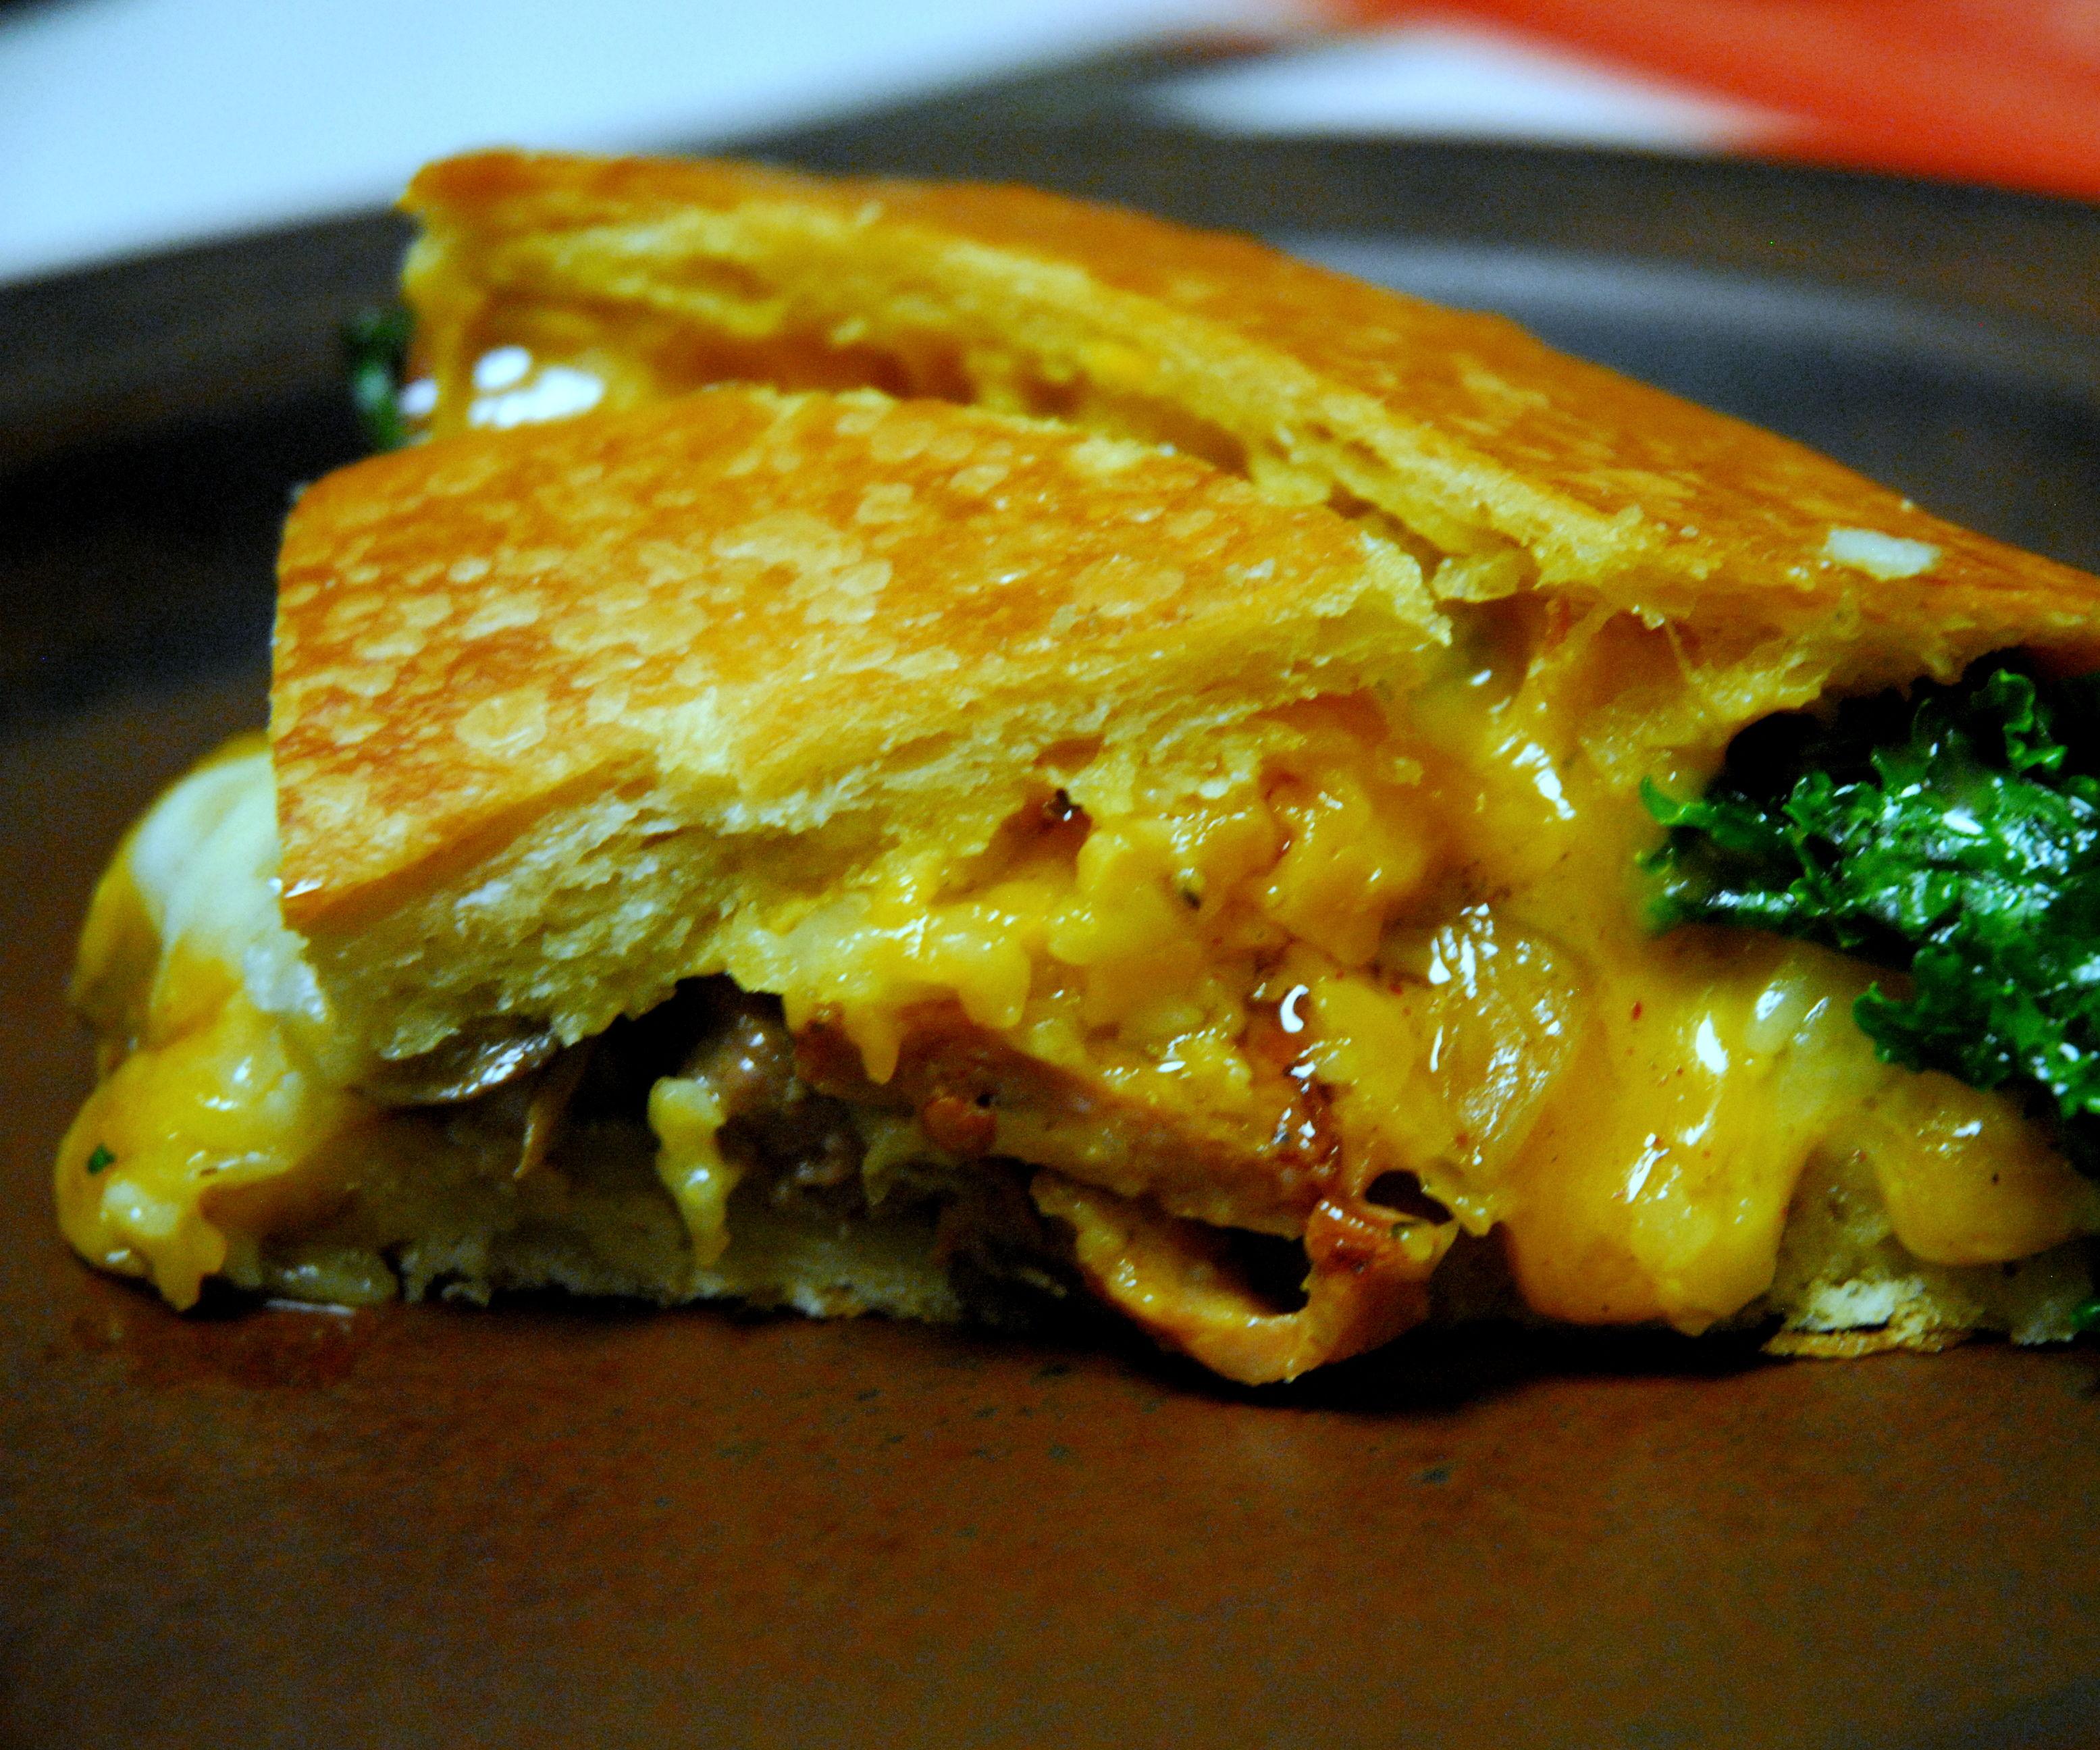 Sandwich Pie